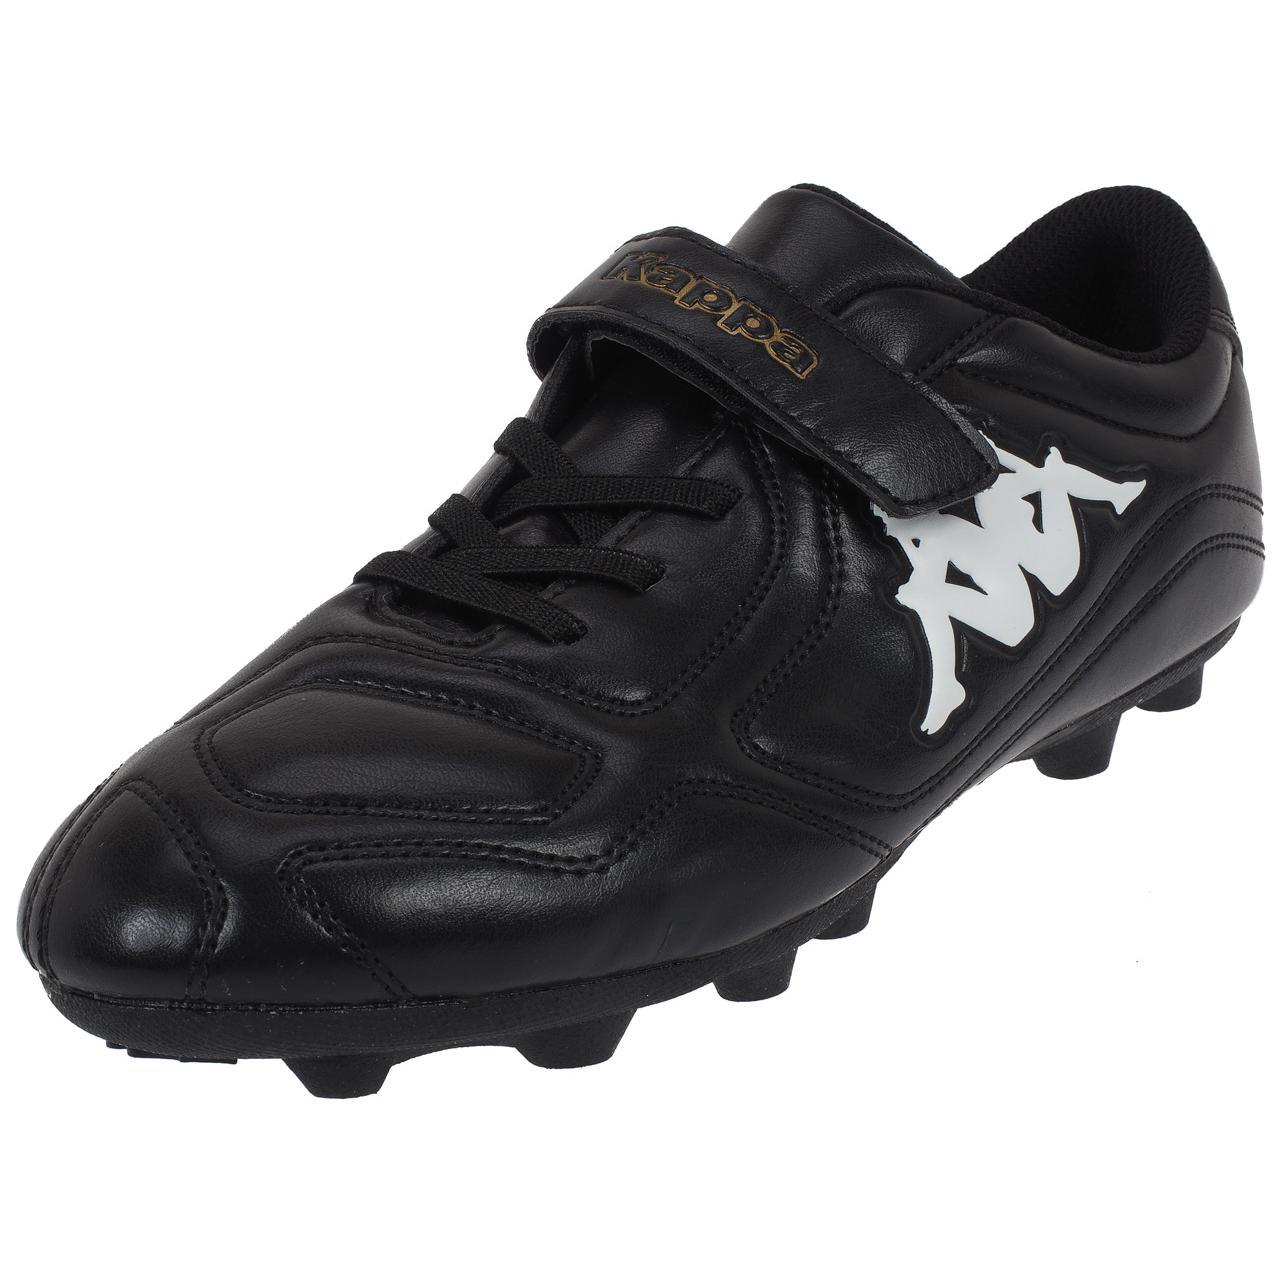 Football-Shoes-Molded-Kappa-Parek-Fg-Kid-Black-Black-75087-New